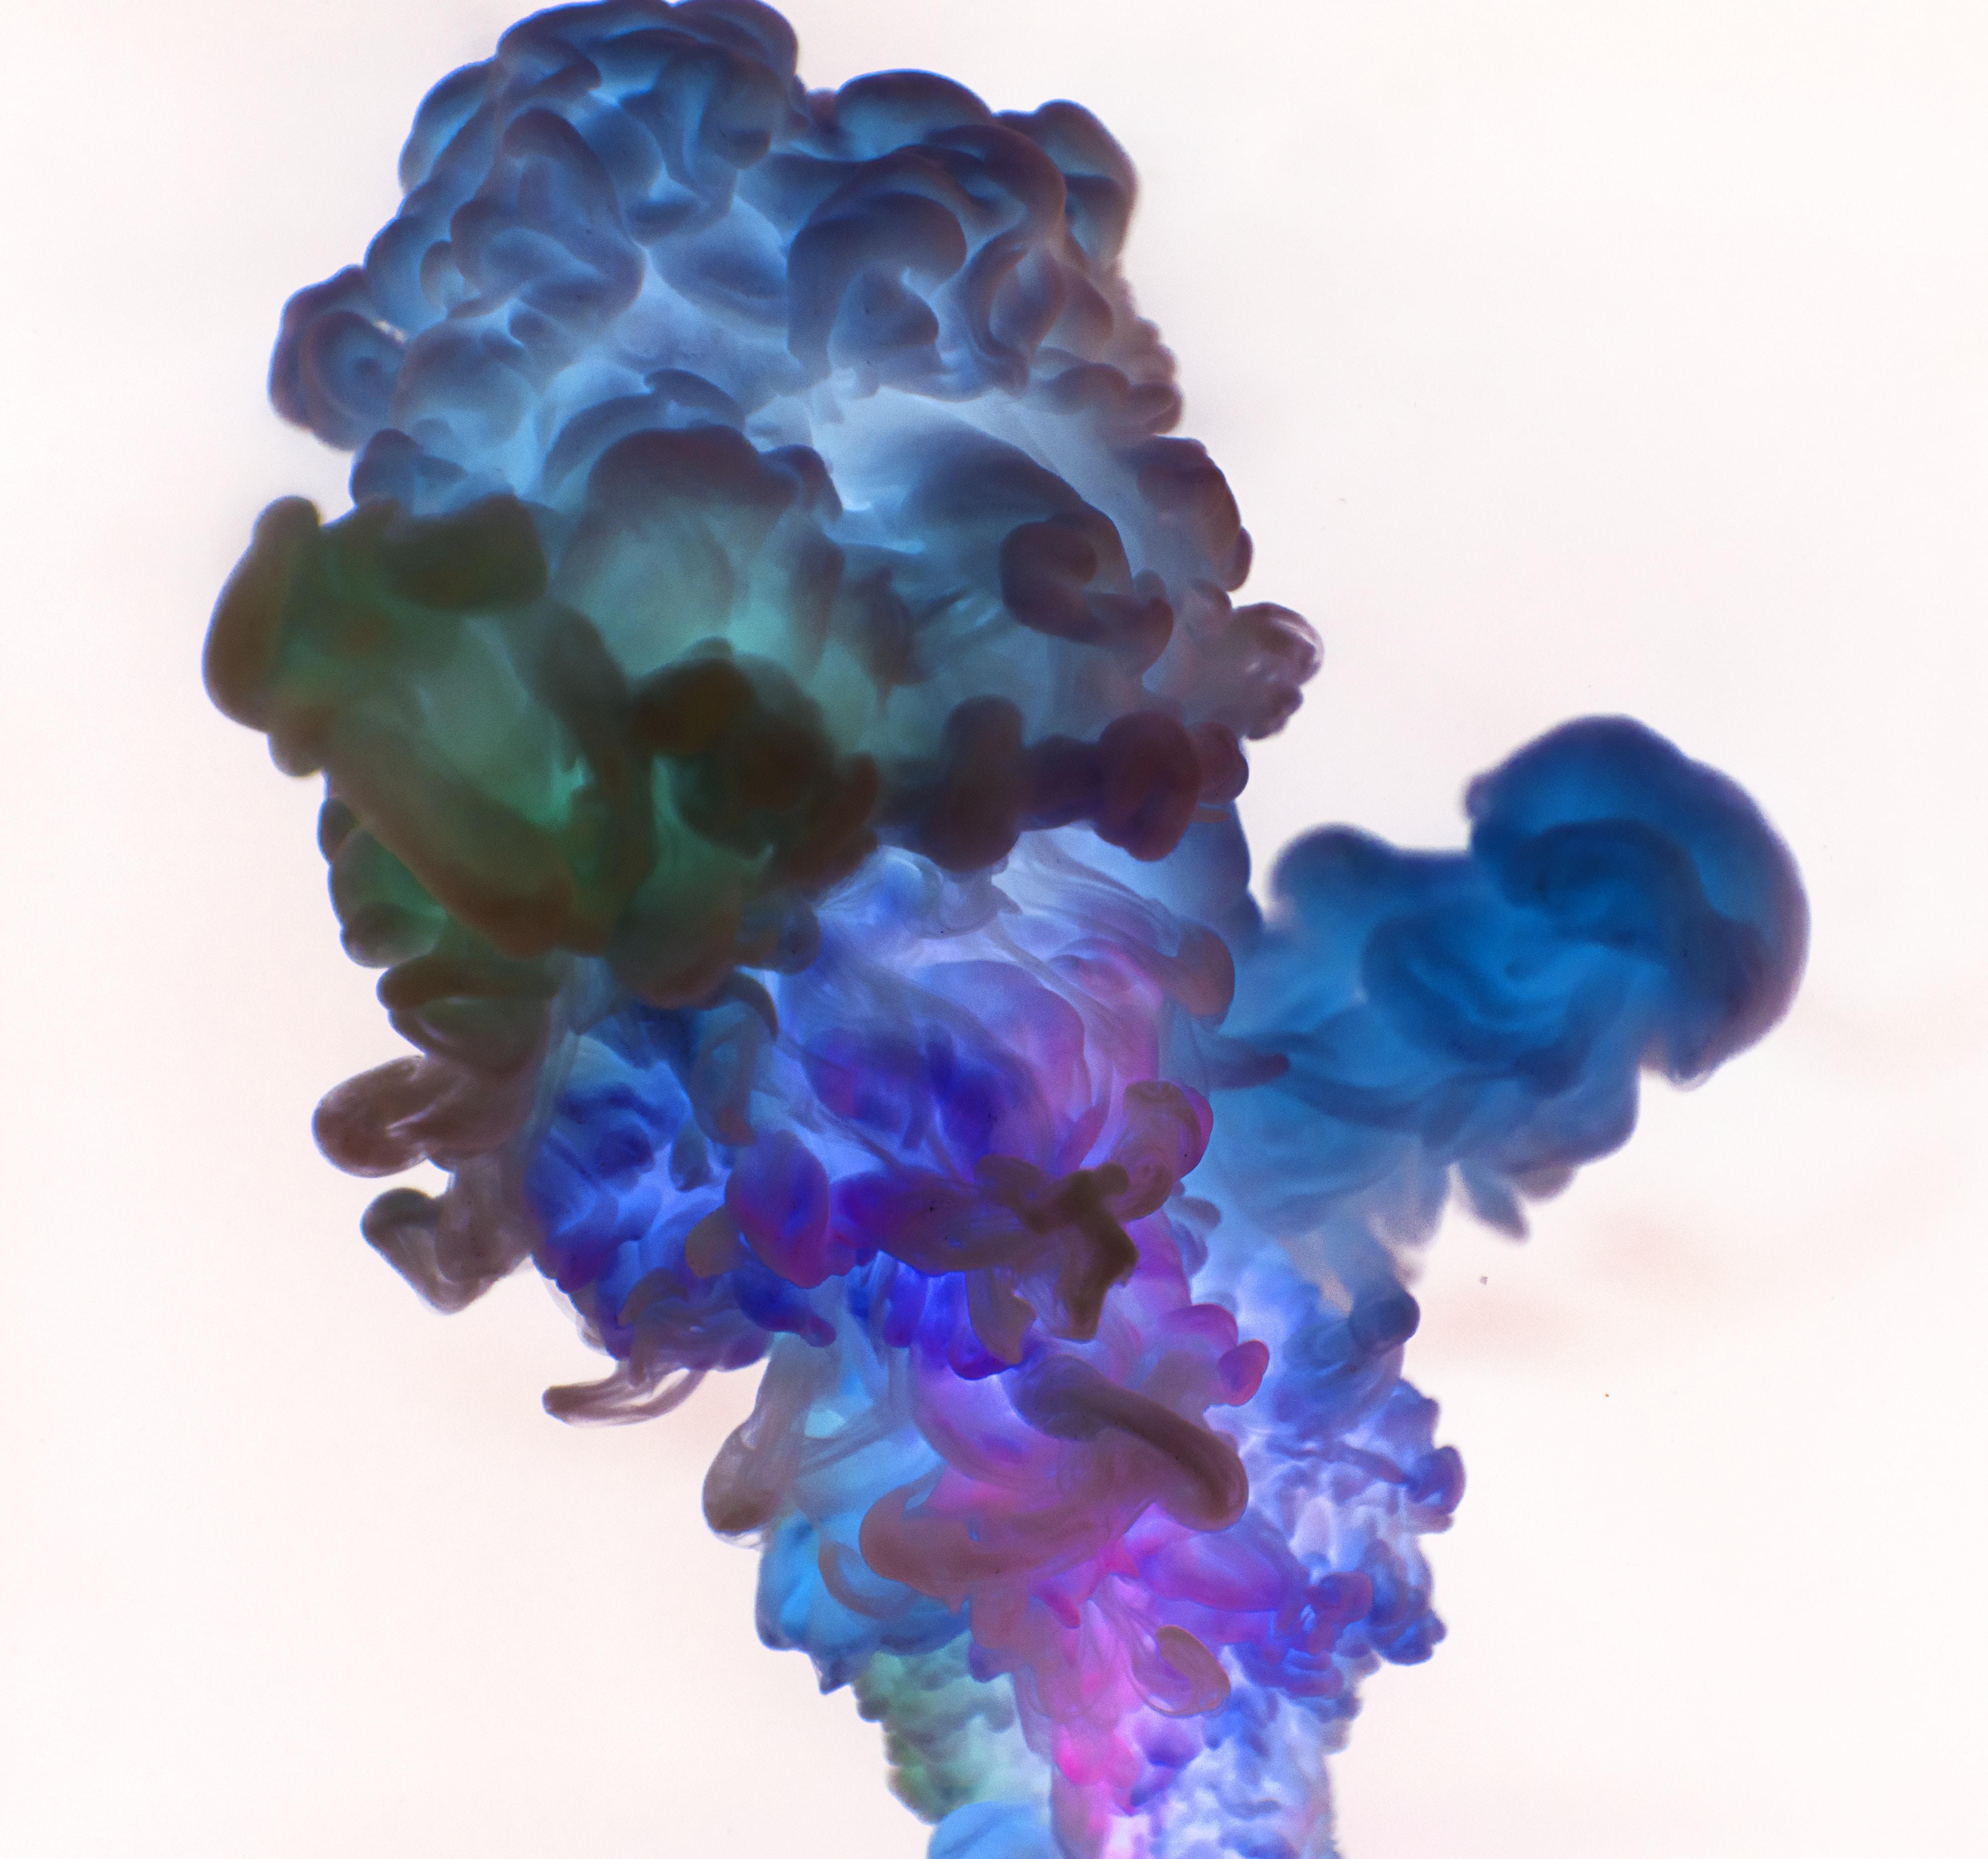 blue and purple smoke wallpaper